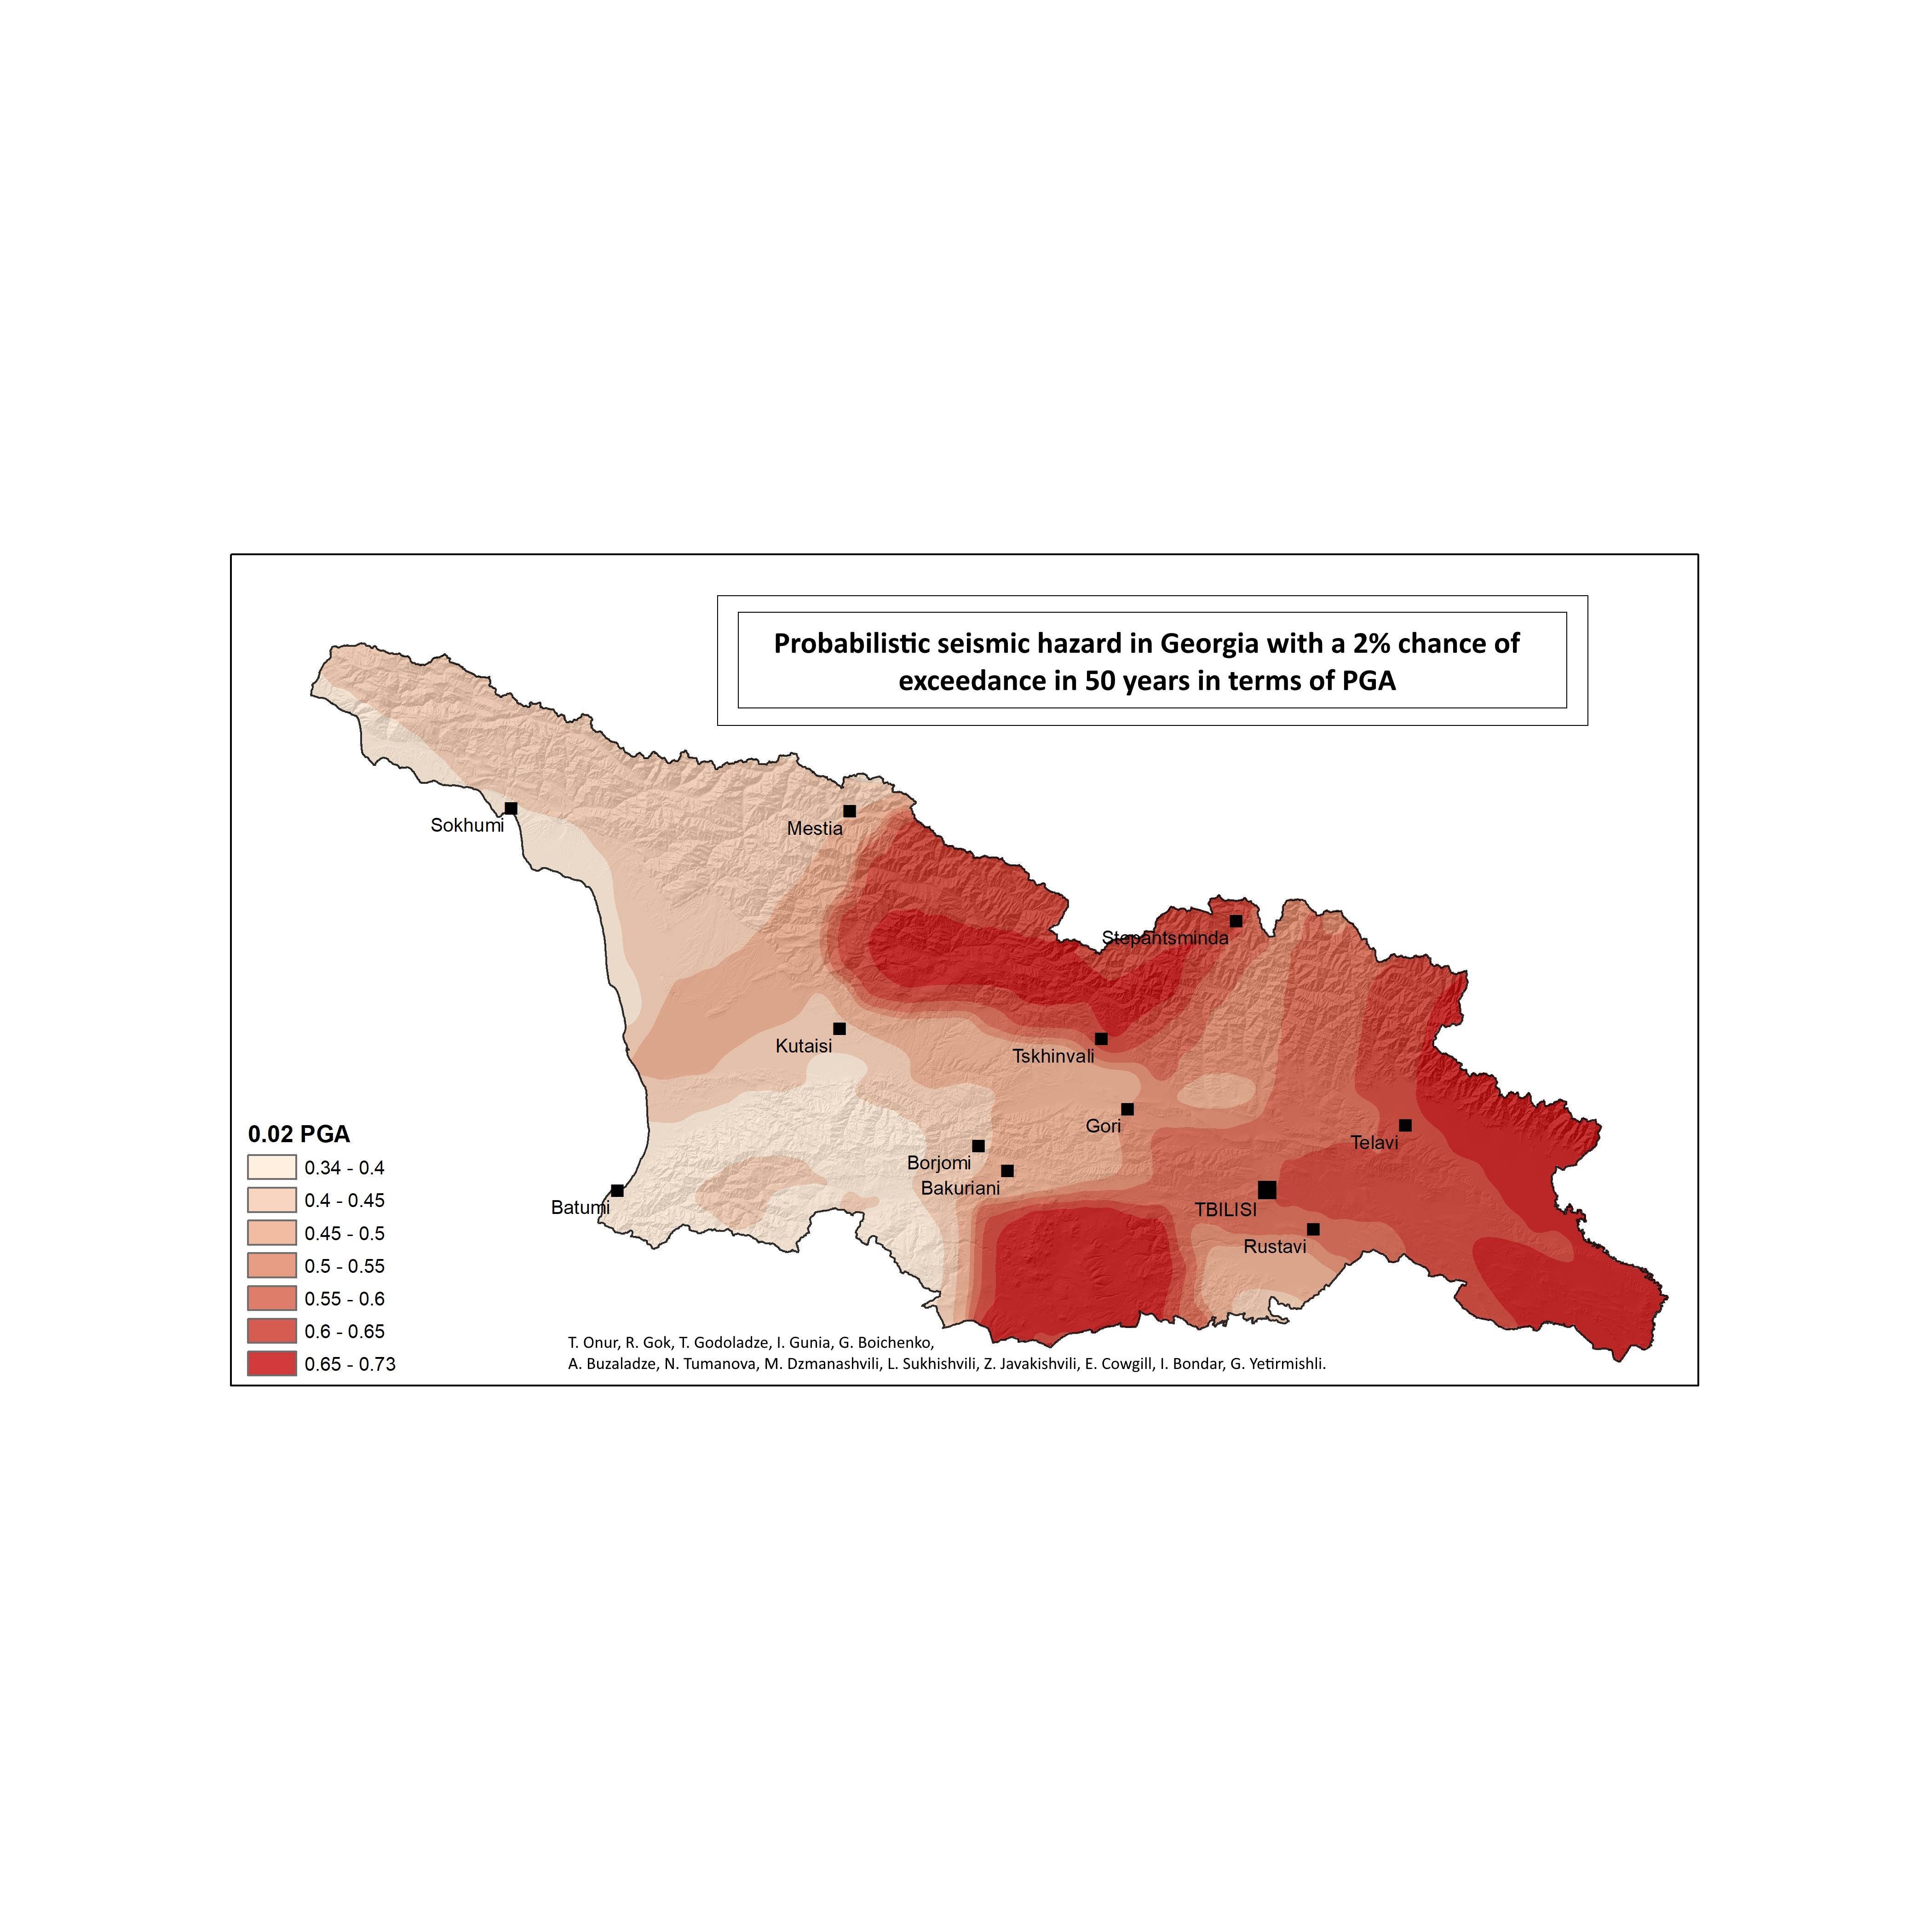 Probabilistic Seismic Hazard Assessment for Georgia